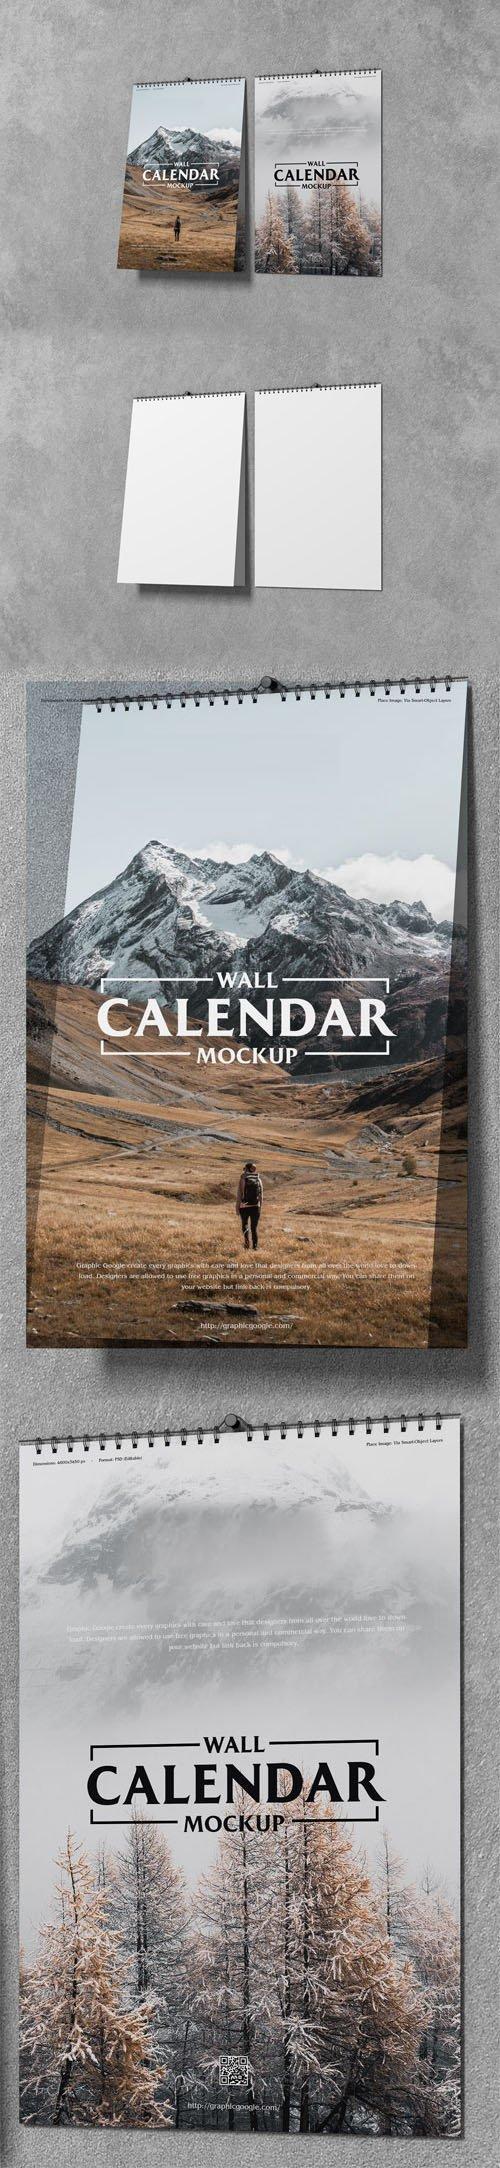 11x17 Wall Calendar PSD Mockup Template